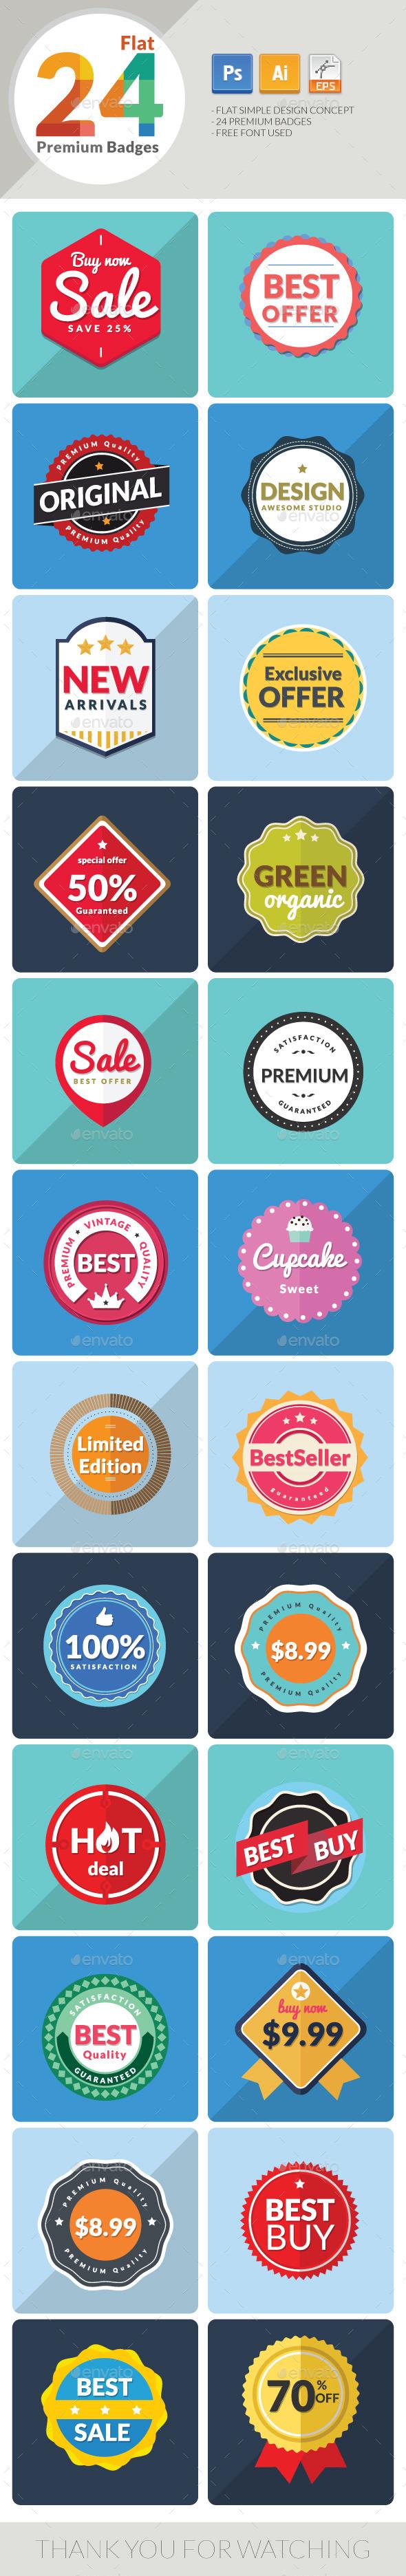 24 Flat Premium Badges - Badges & Stickers Web Elements